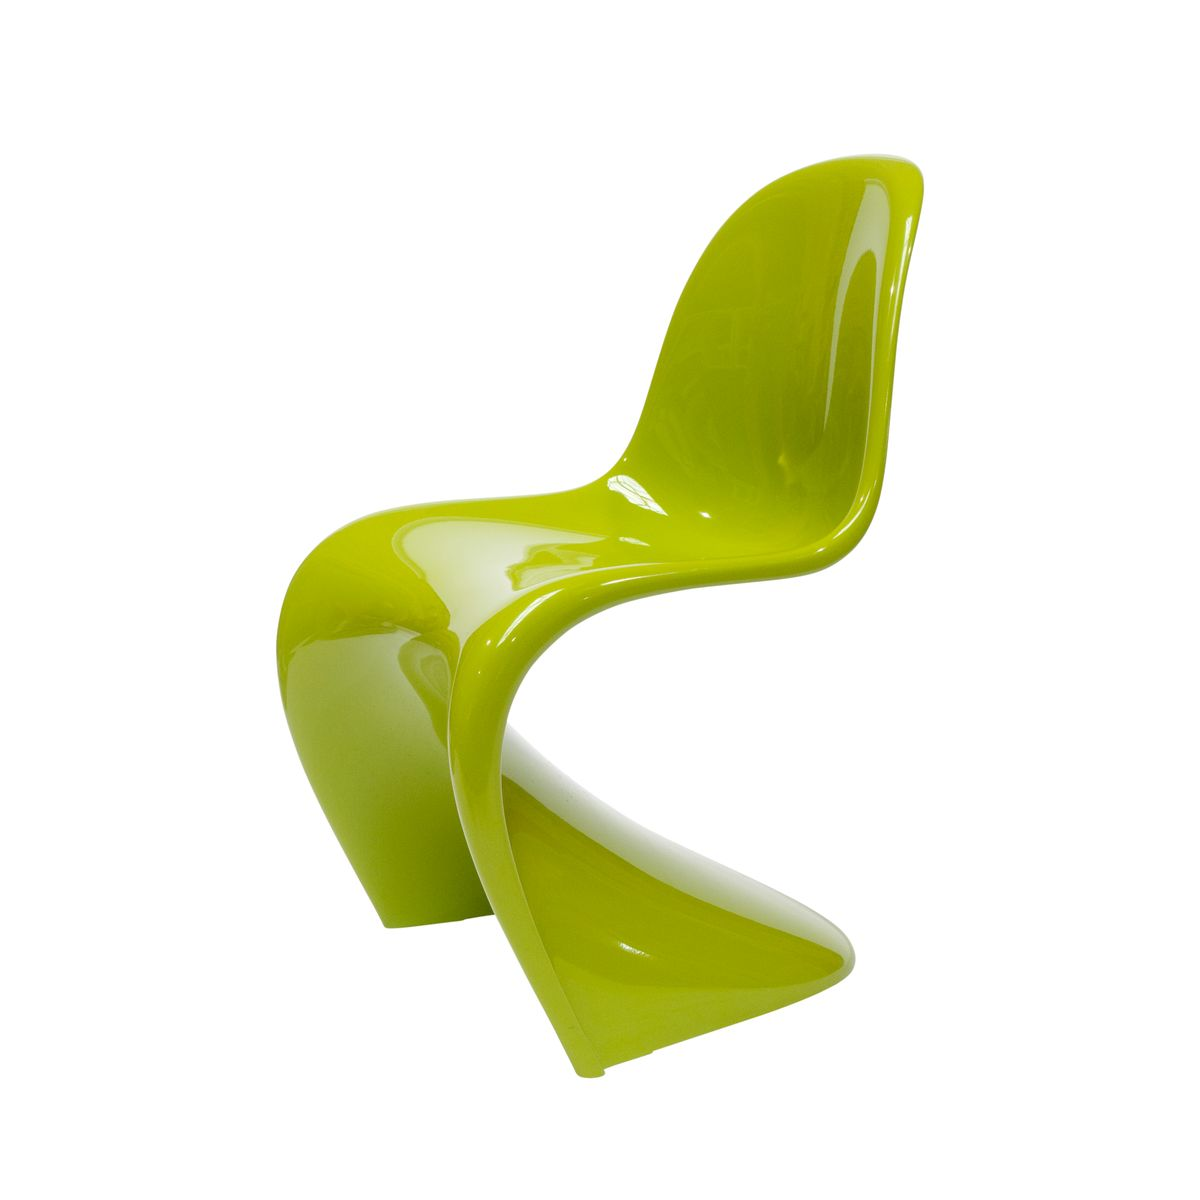 the panton chair in chartreuse von verner panton f r vitra 2006 bei pamono kaufen. Black Bedroom Furniture Sets. Home Design Ideas